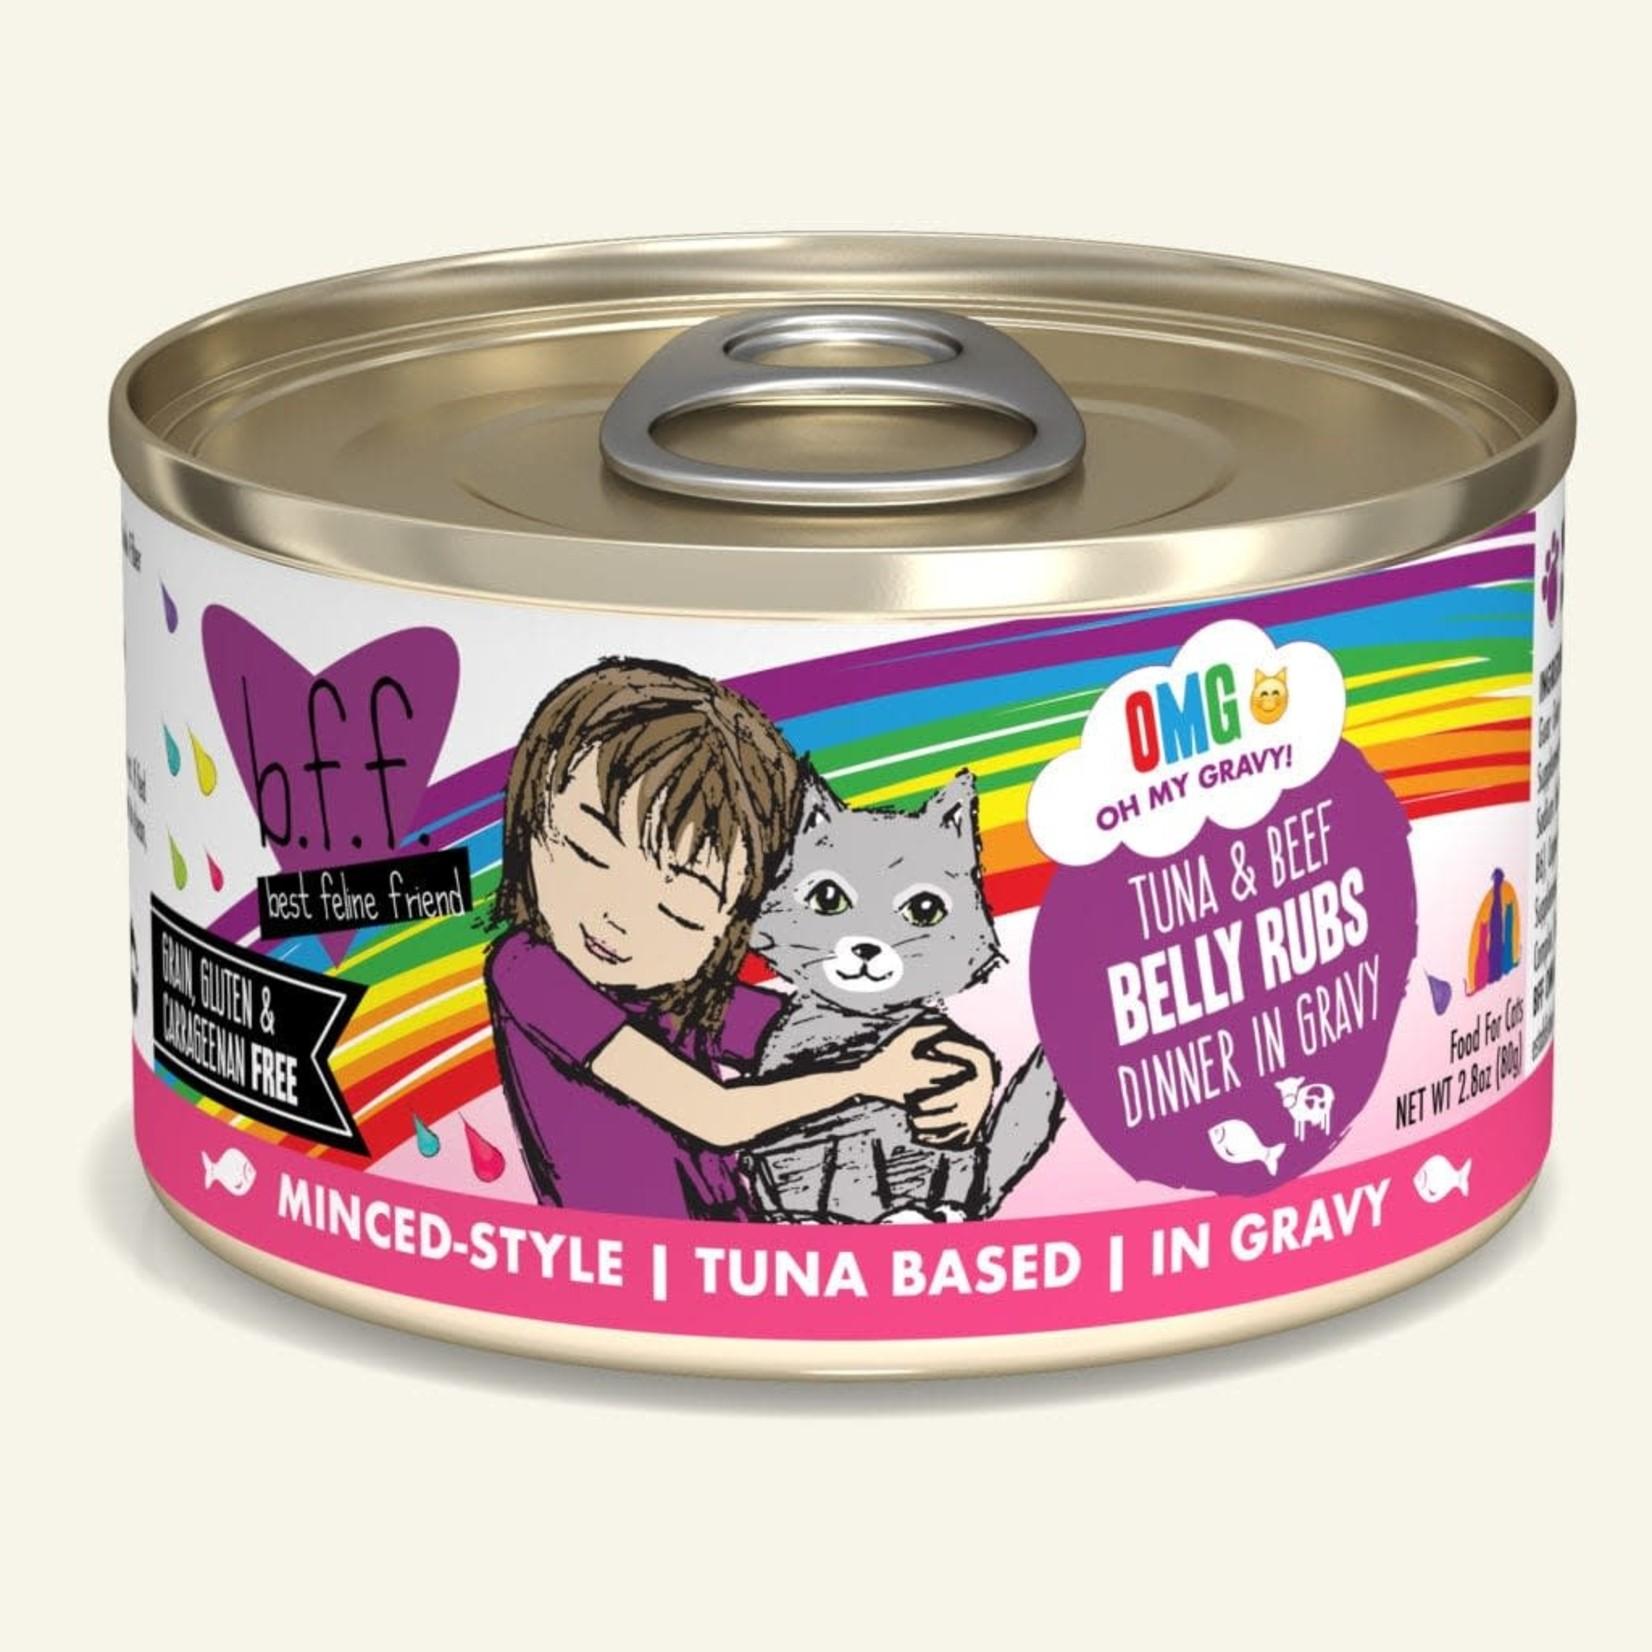 Weruva BFF OMG Cat Tuna & Beef Belly Rubs 2.8 OZ